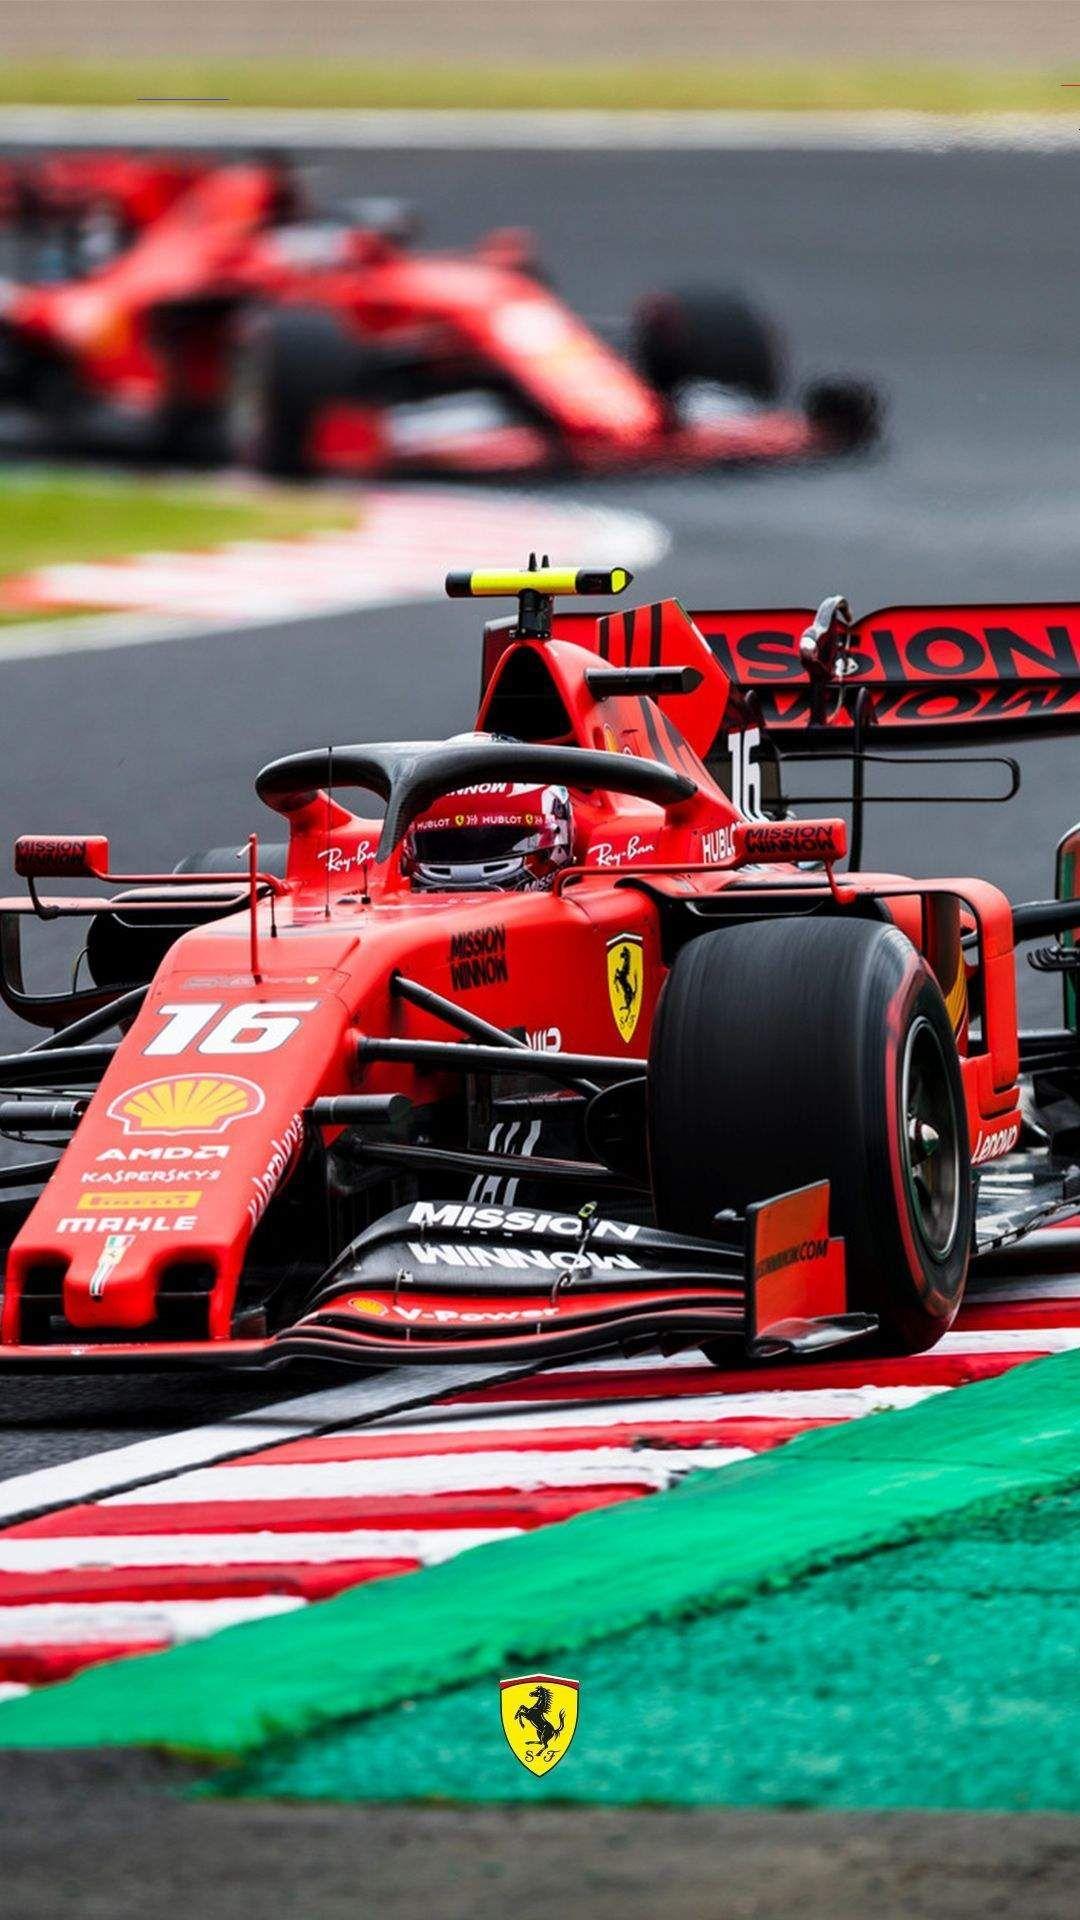 Ferrari458italia In 2020 Formula 1 Car Ferrari Scuderia Ferrari Car